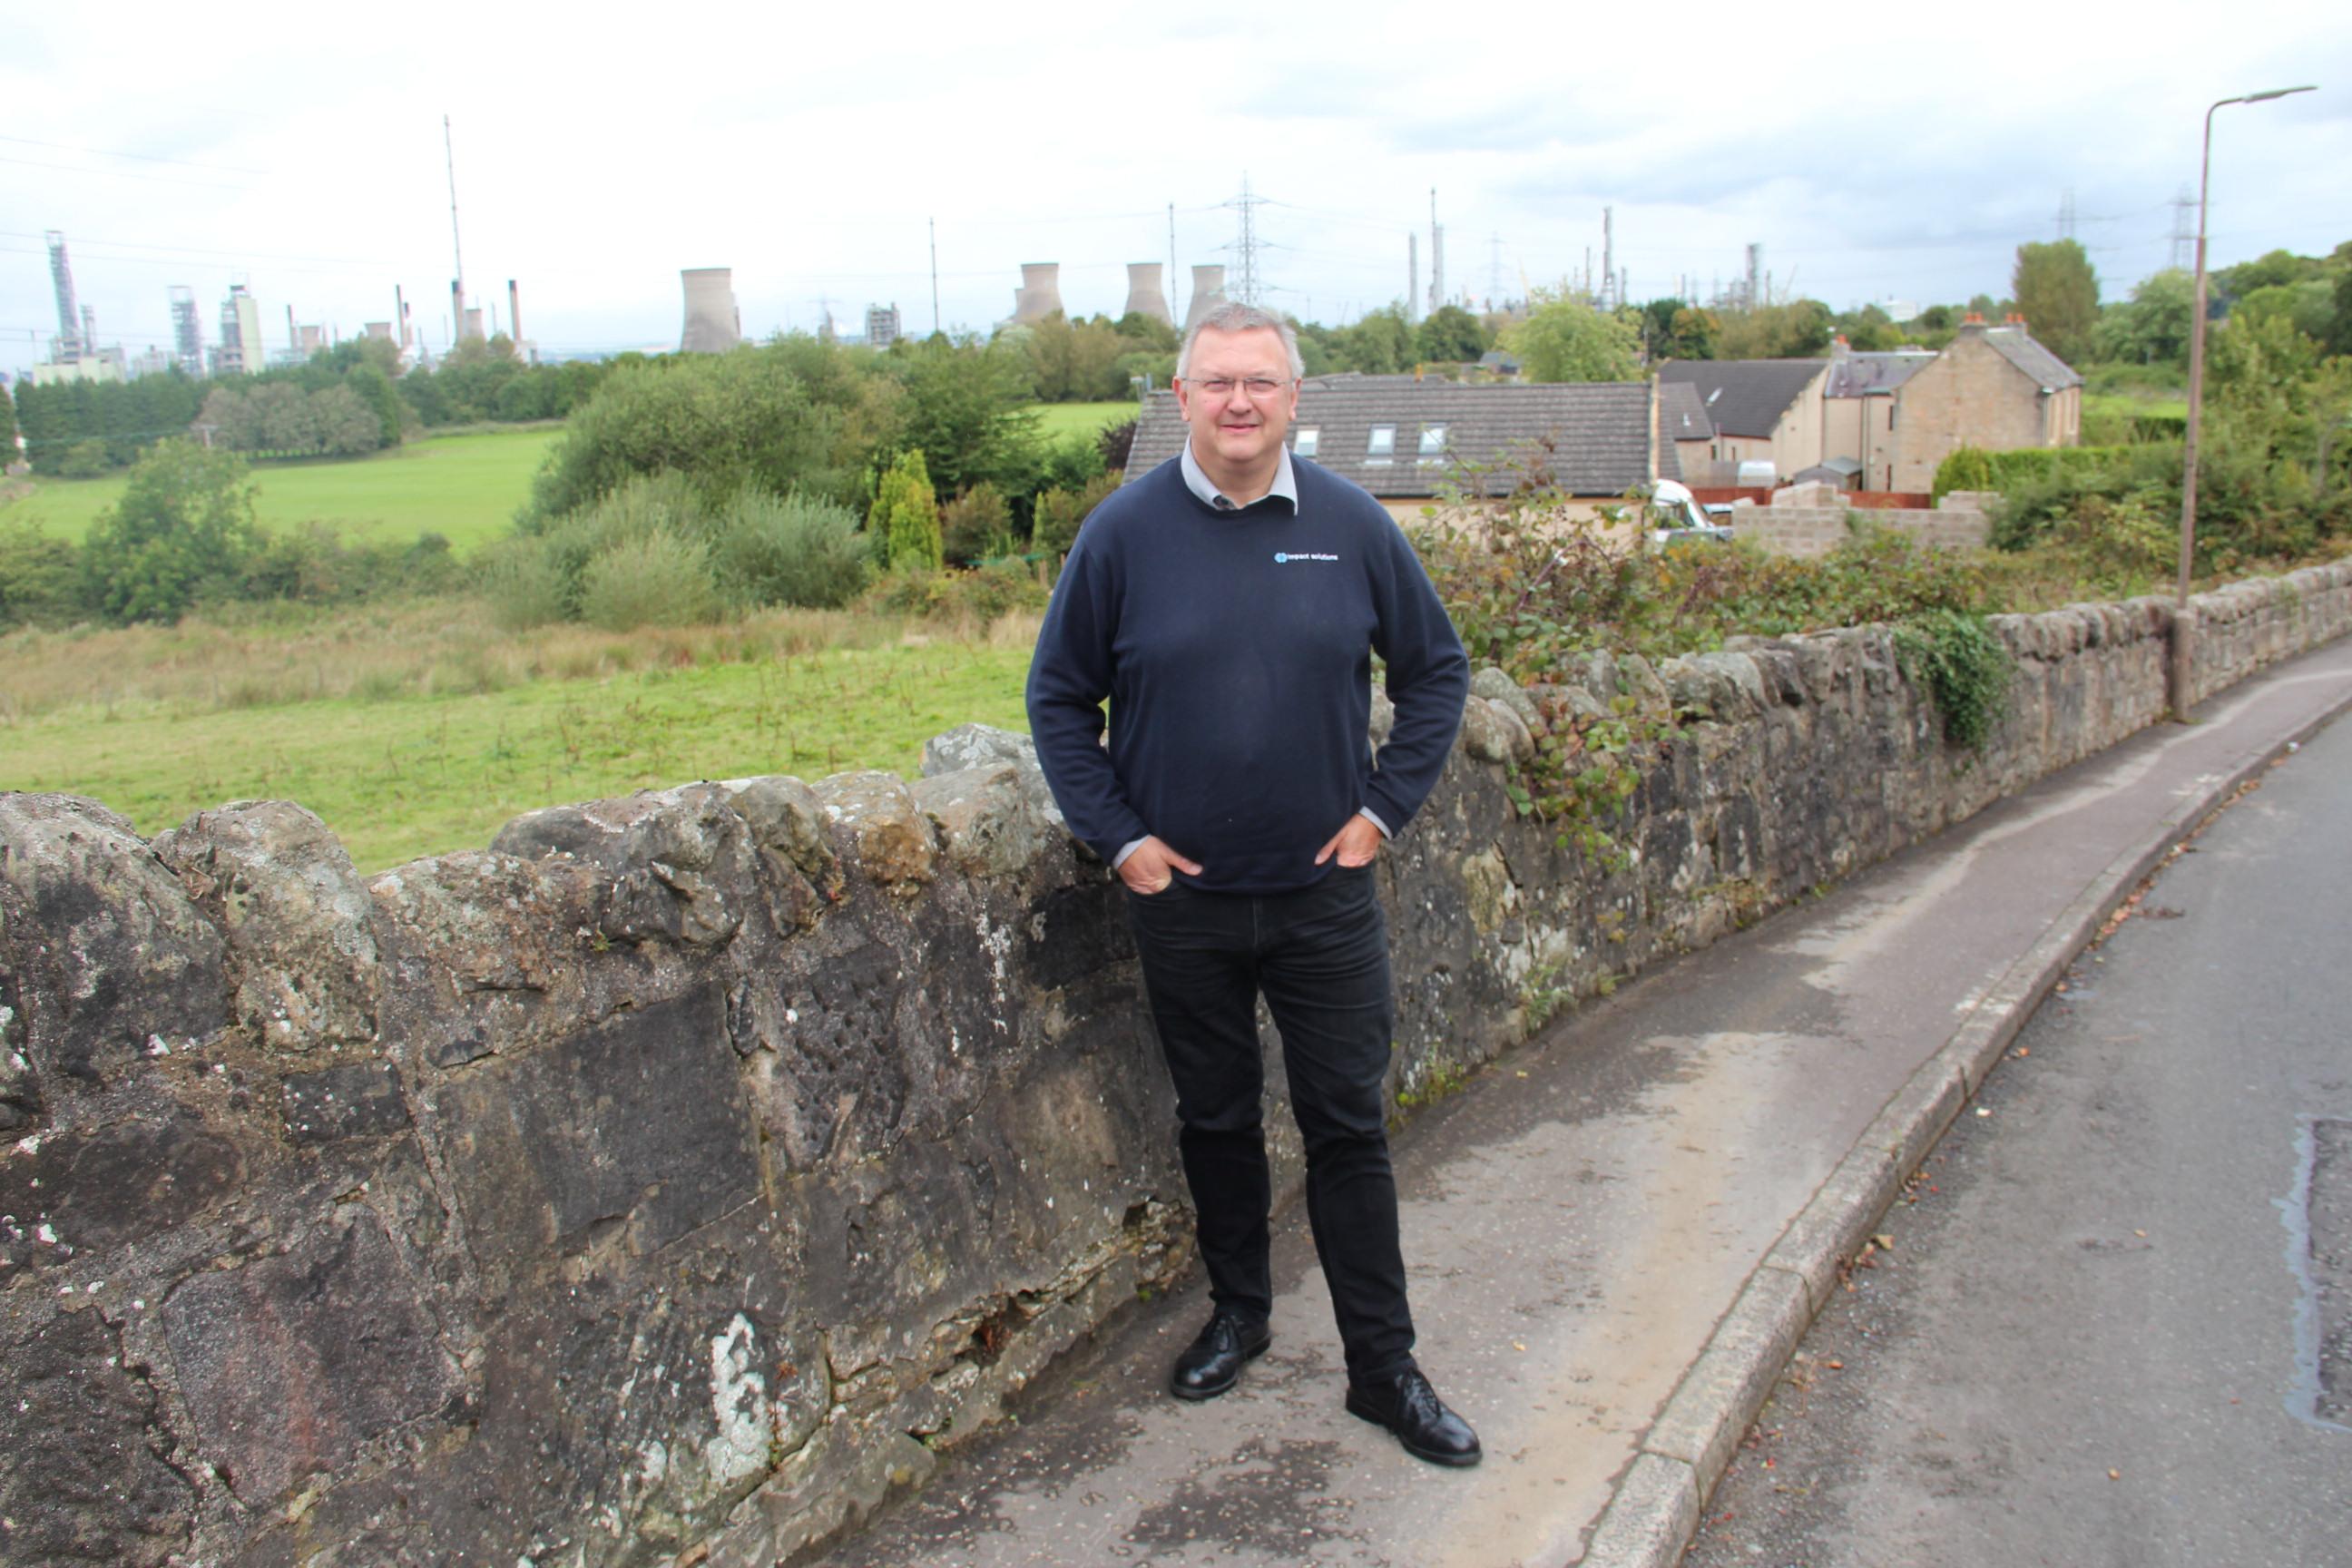 At Grangemouth refinery in Scotland, a plastics evangelist says U.S. shale gas is vital